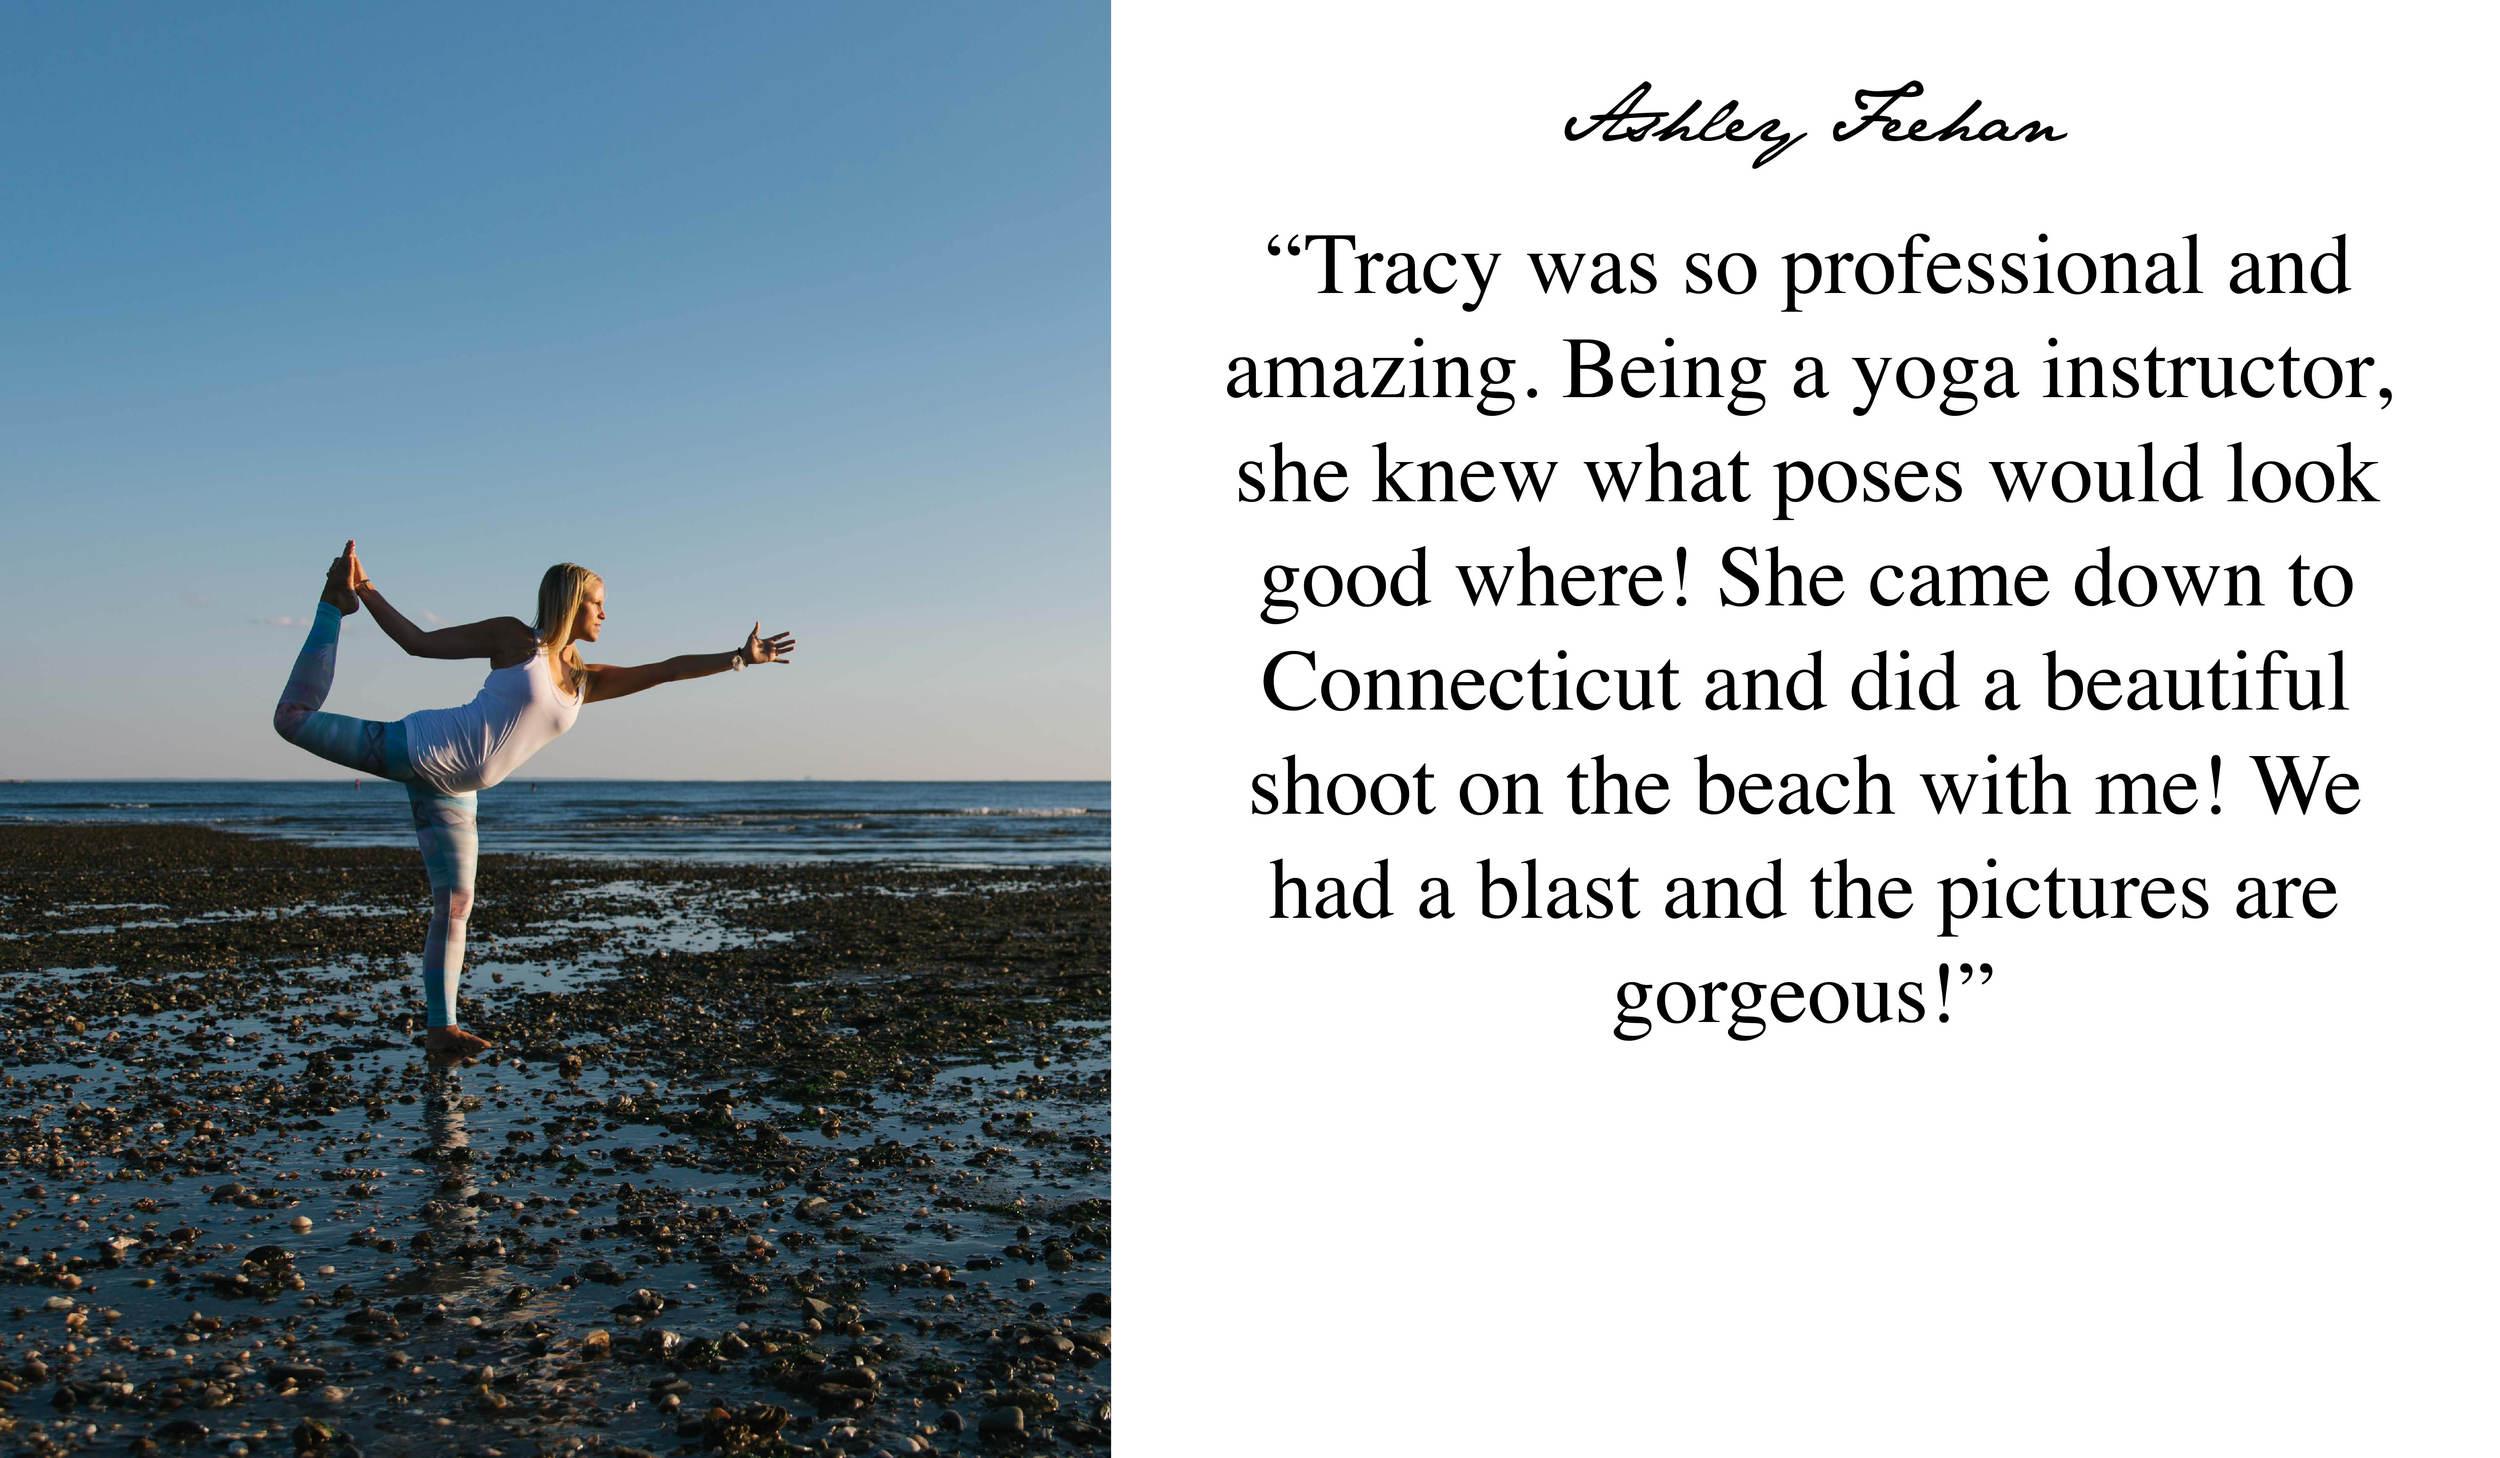 Tracy_Rodriguez_Photography_Review_Yoga_Ashley_Feehan_Yoga.jpg